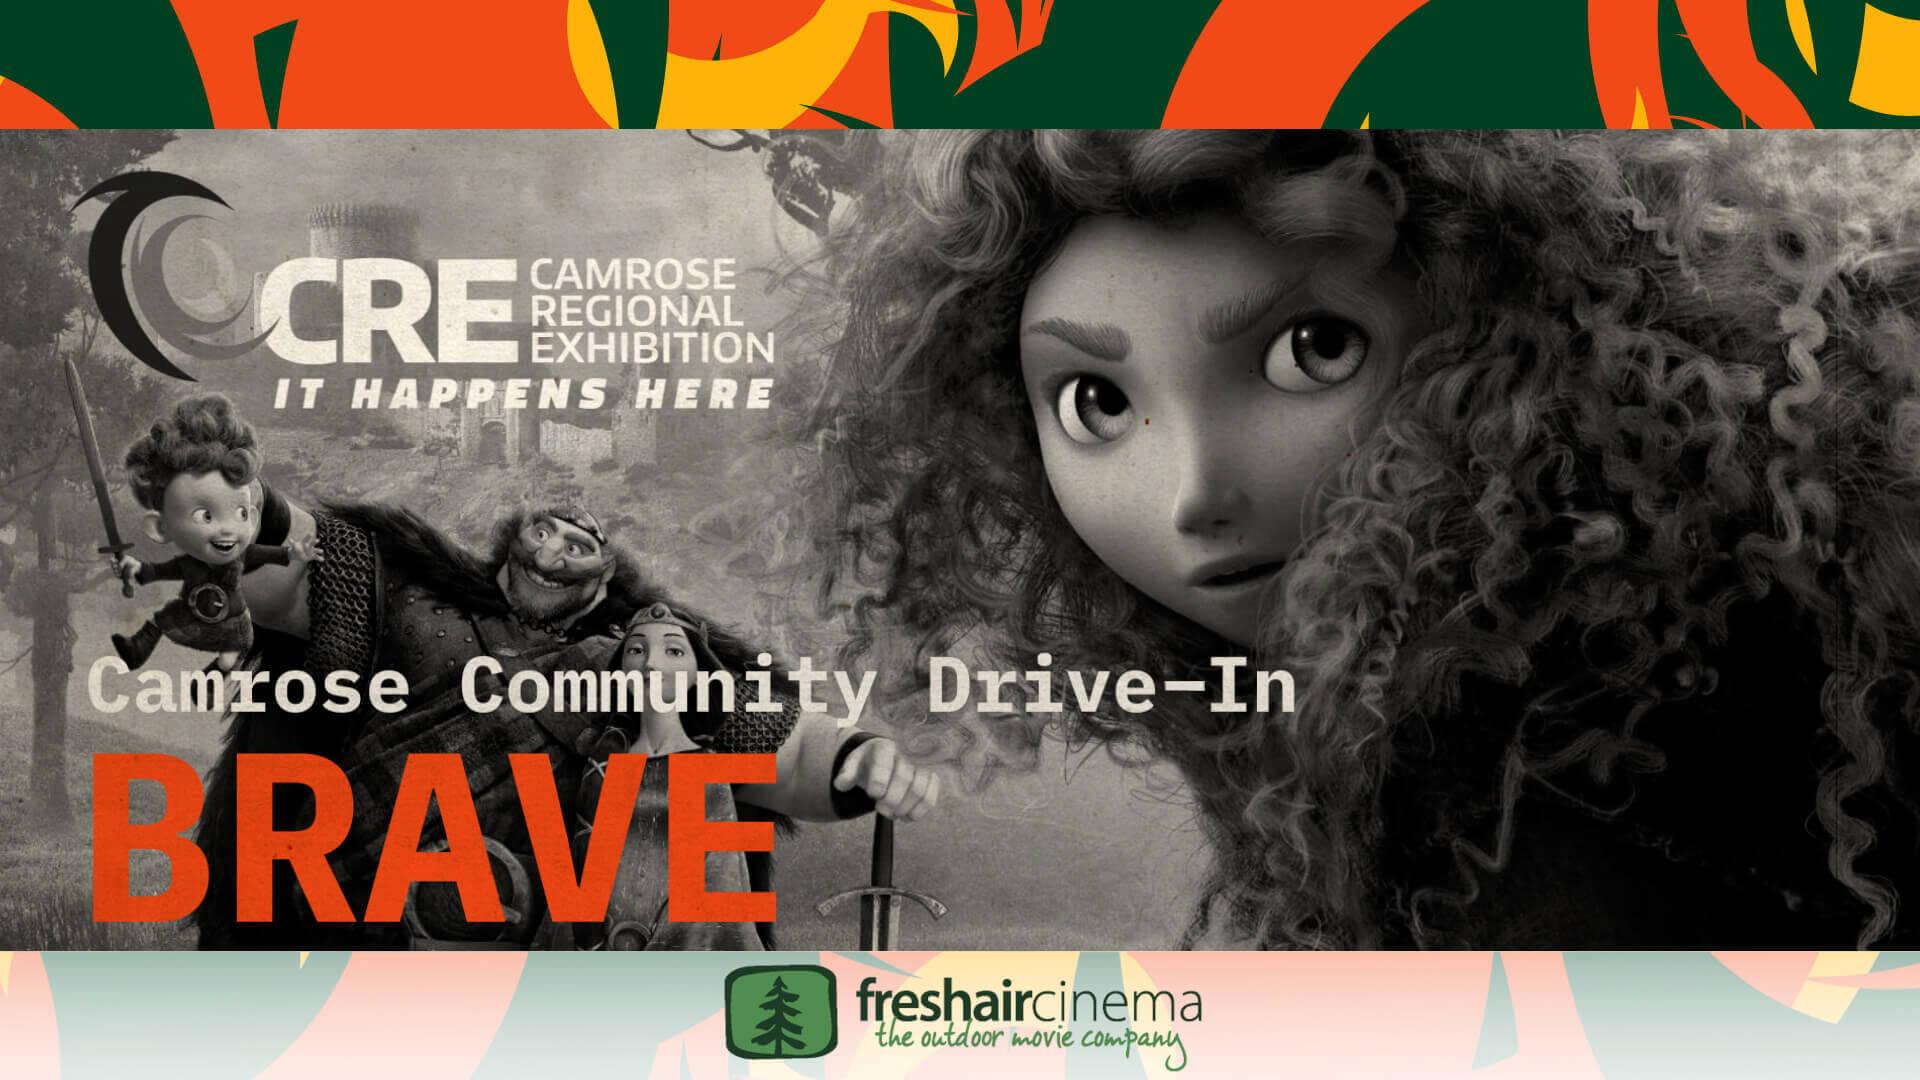 Camrose Community Drive-In - Brave